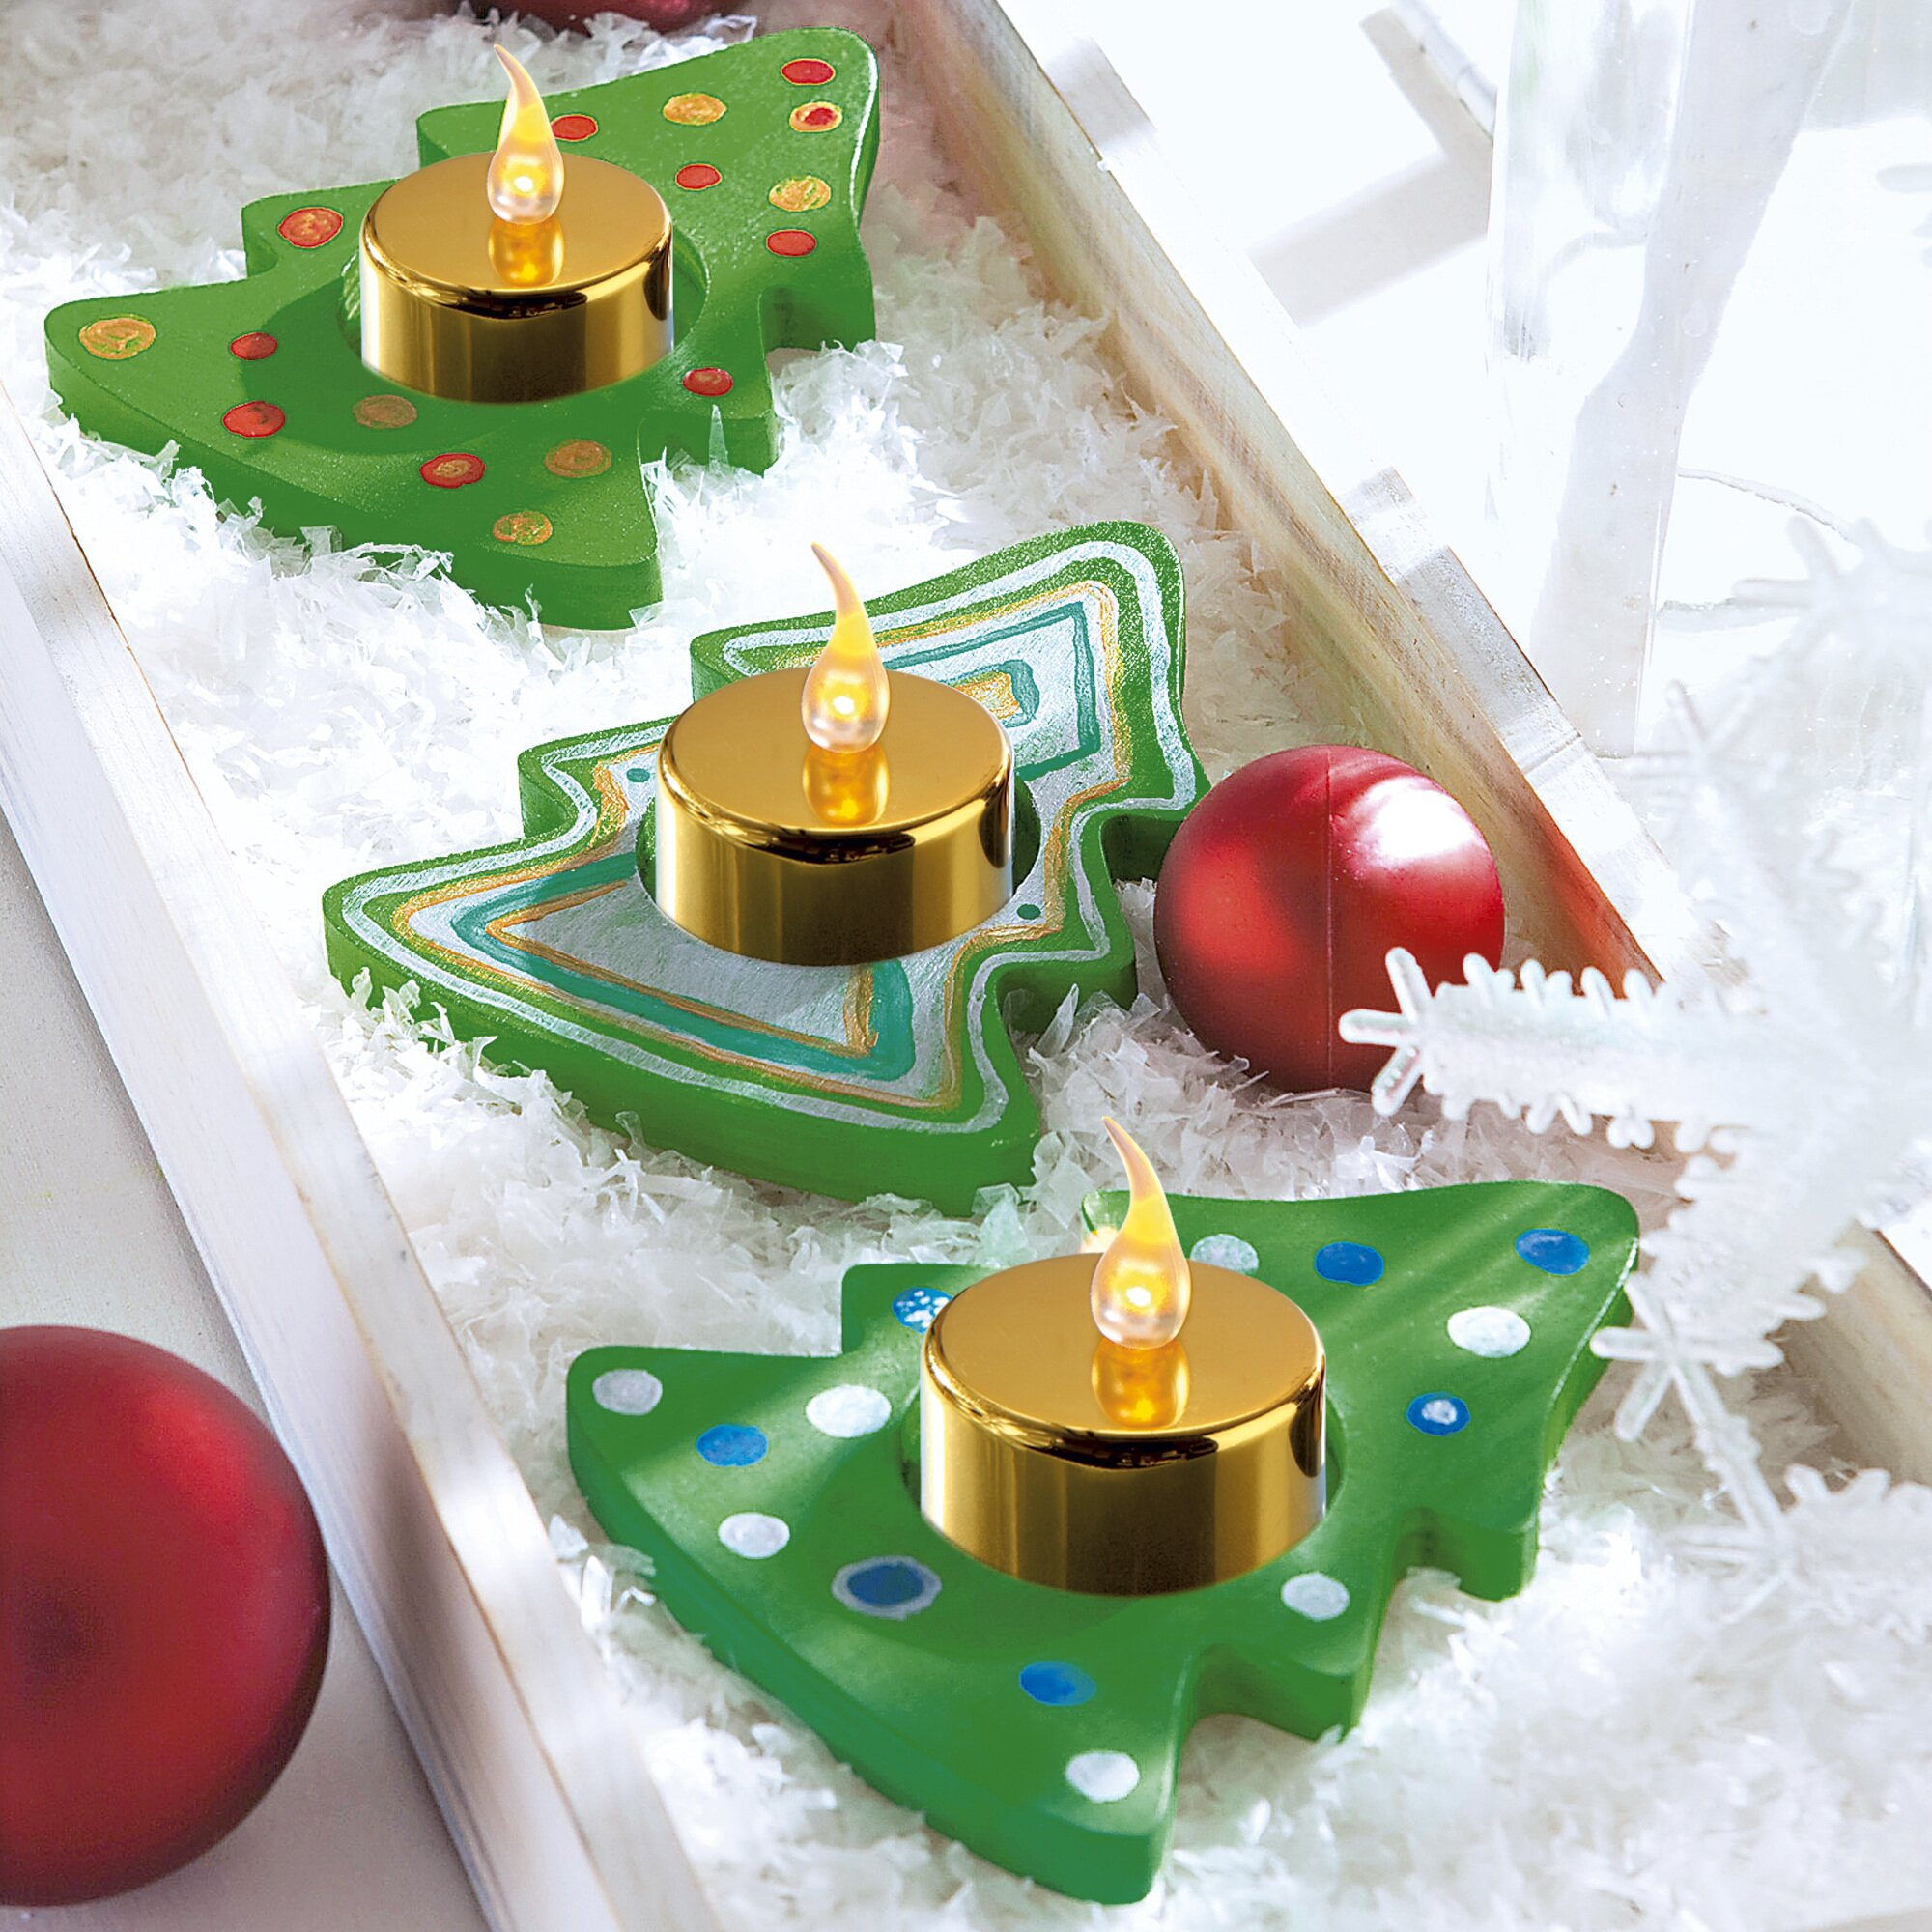 peinture sur bois peinture bricolage page n 5. Black Bedroom Furniture Sets. Home Design Ideas